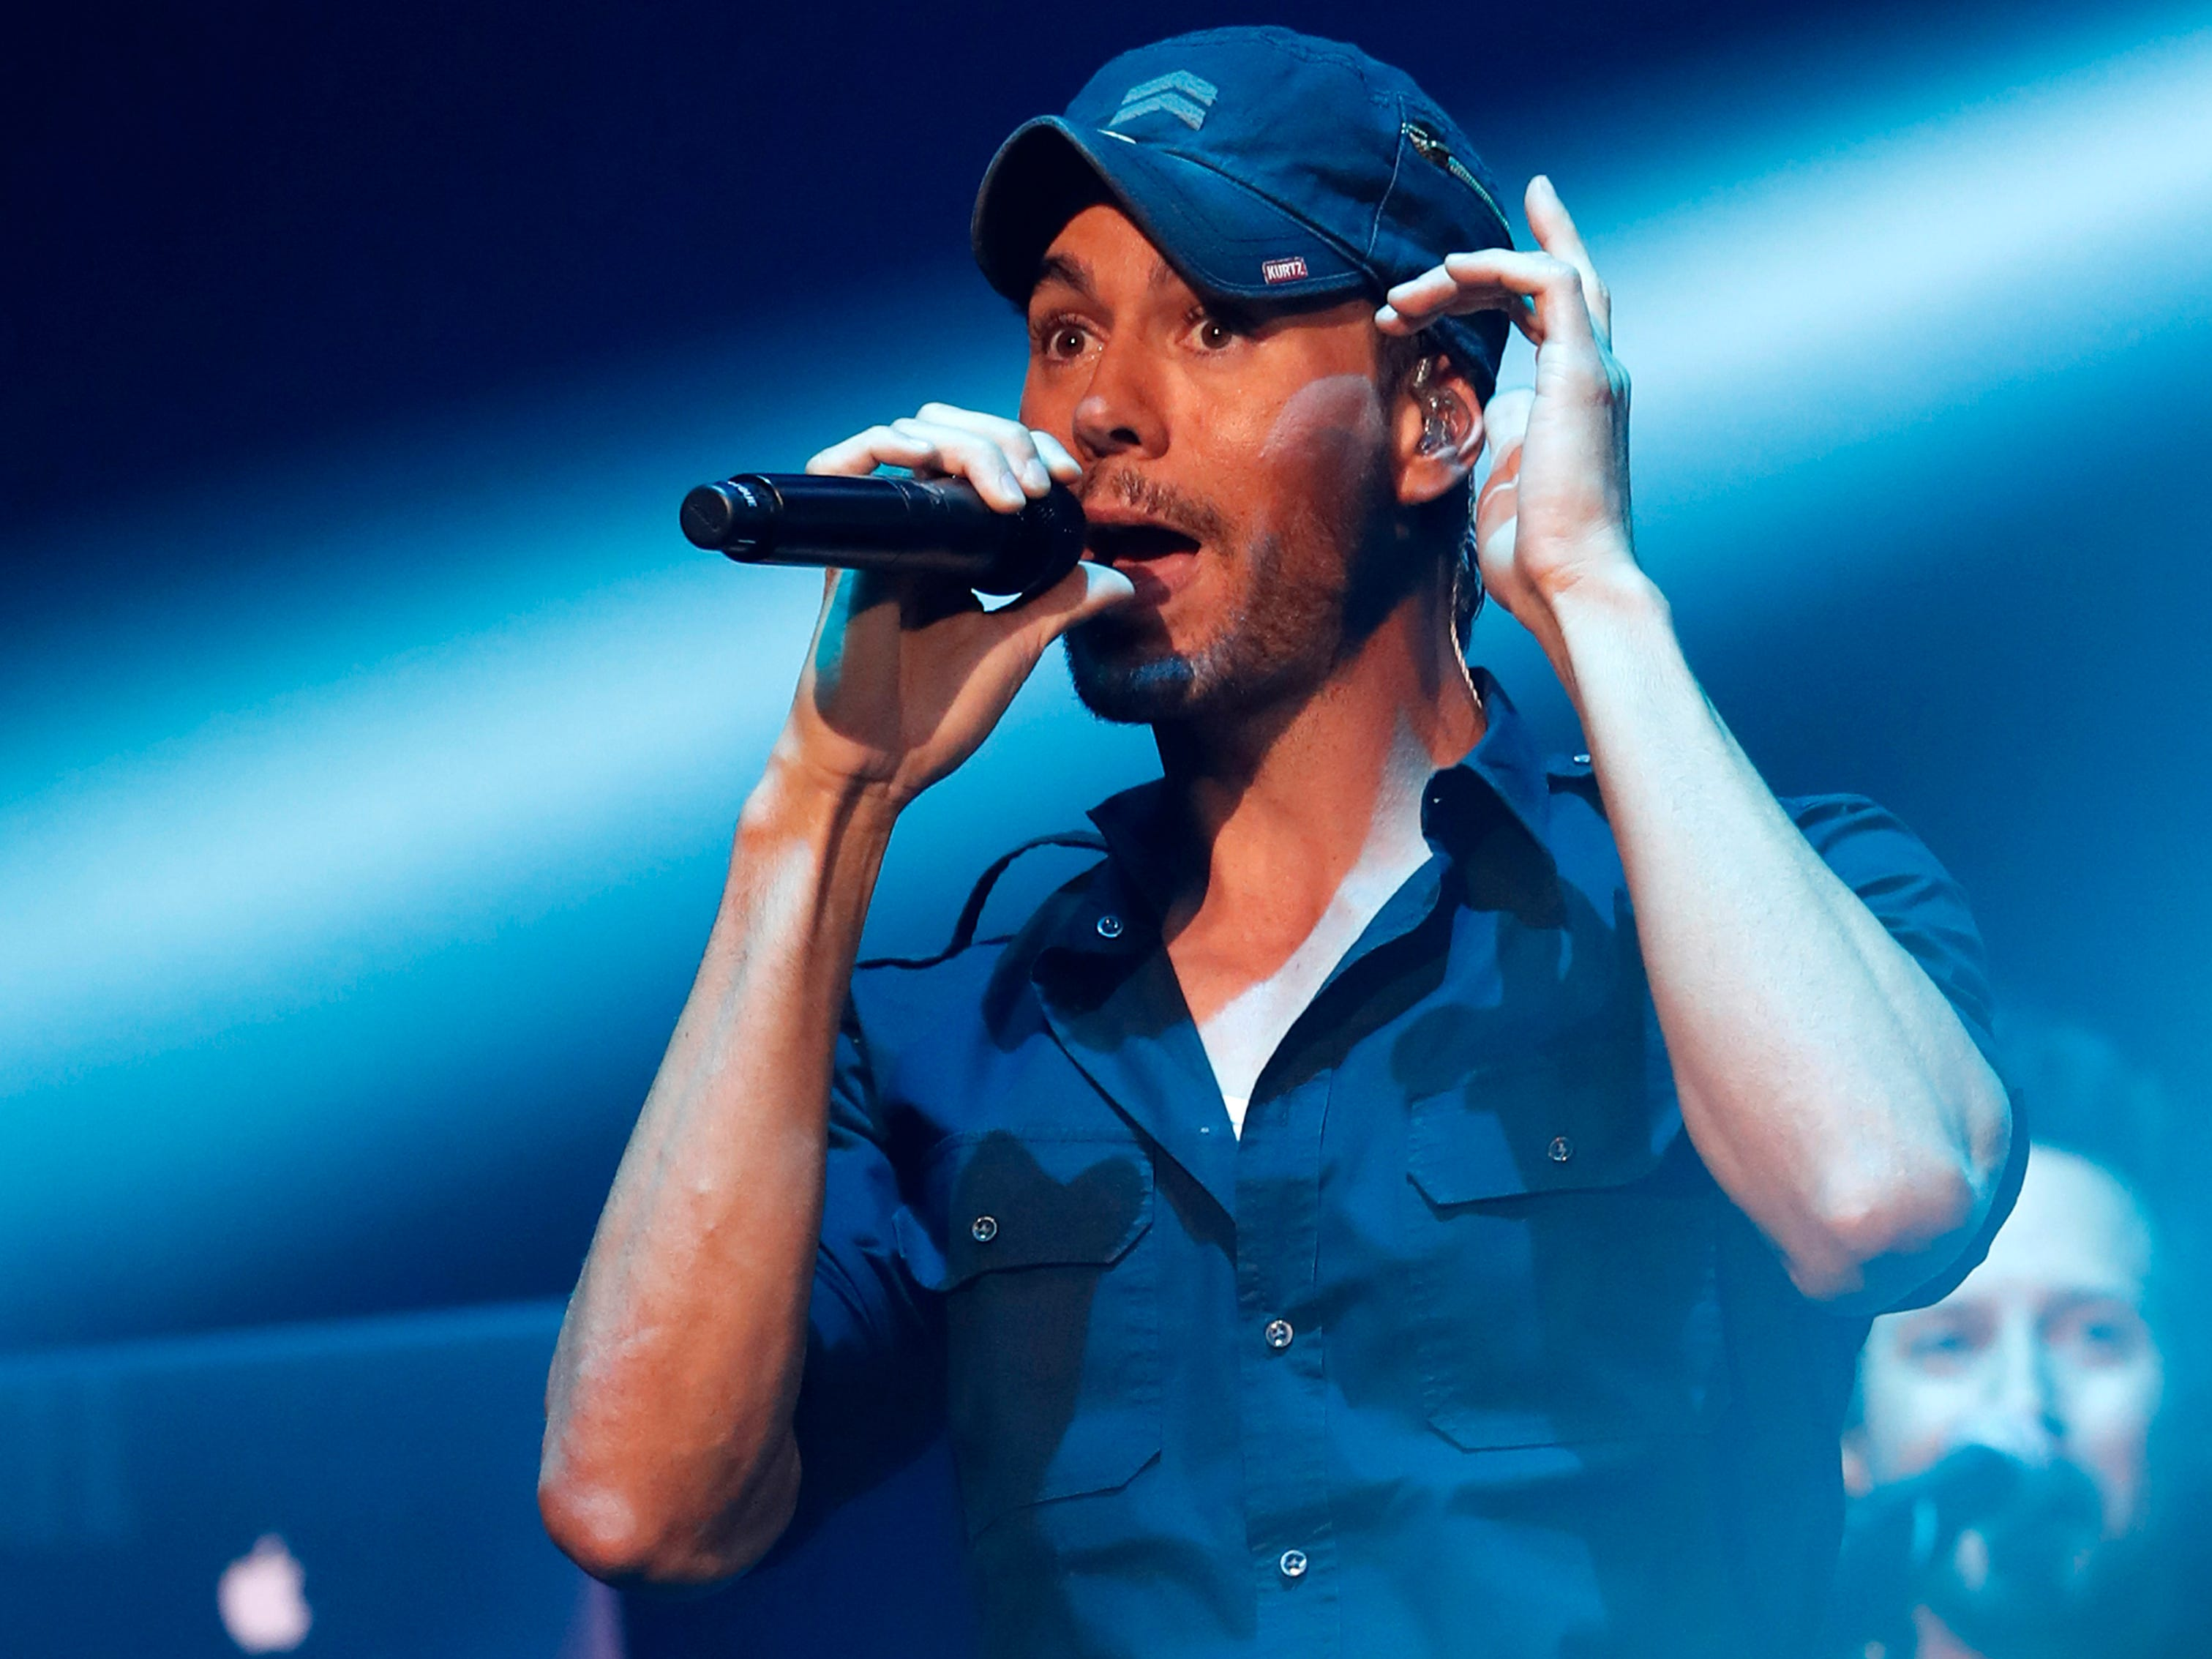 Latin pop star Enrique Iglesias has yet to perform in Milwaukee.